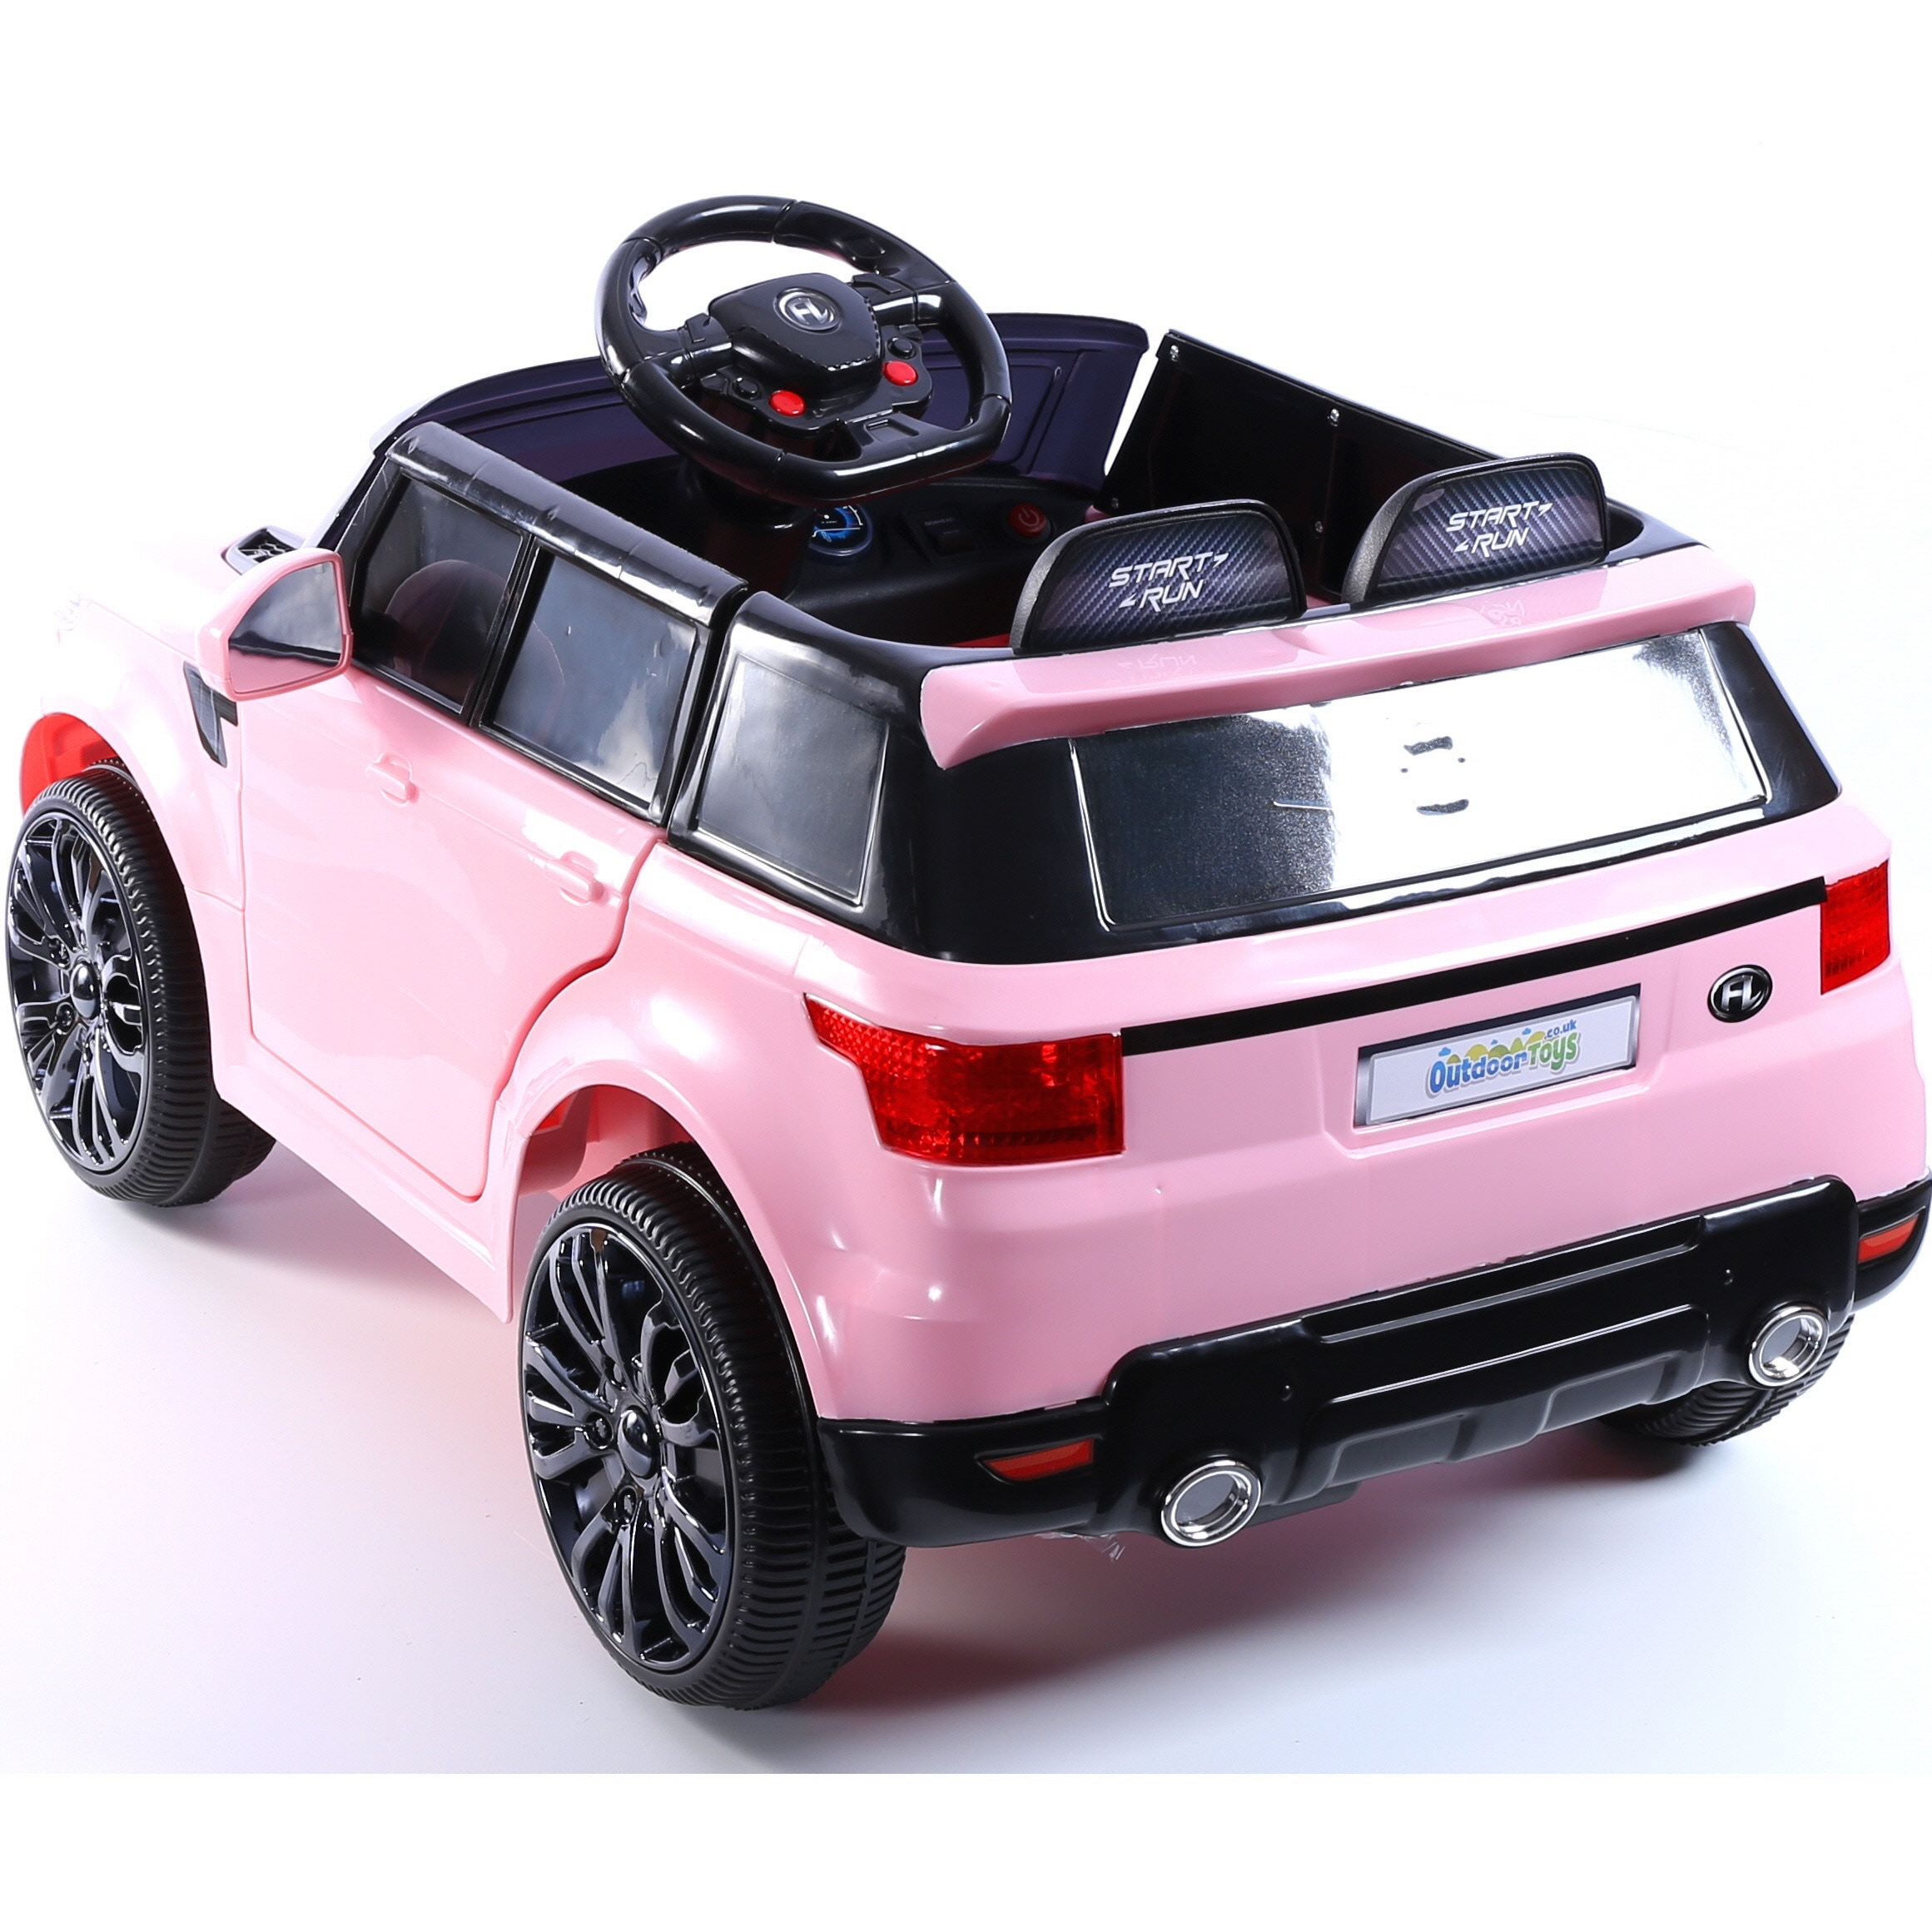 12v range rover style mini hse children s single seat ride on jeep pink 5060225288442 ebay. Black Bedroom Furniture Sets. Home Design Ideas